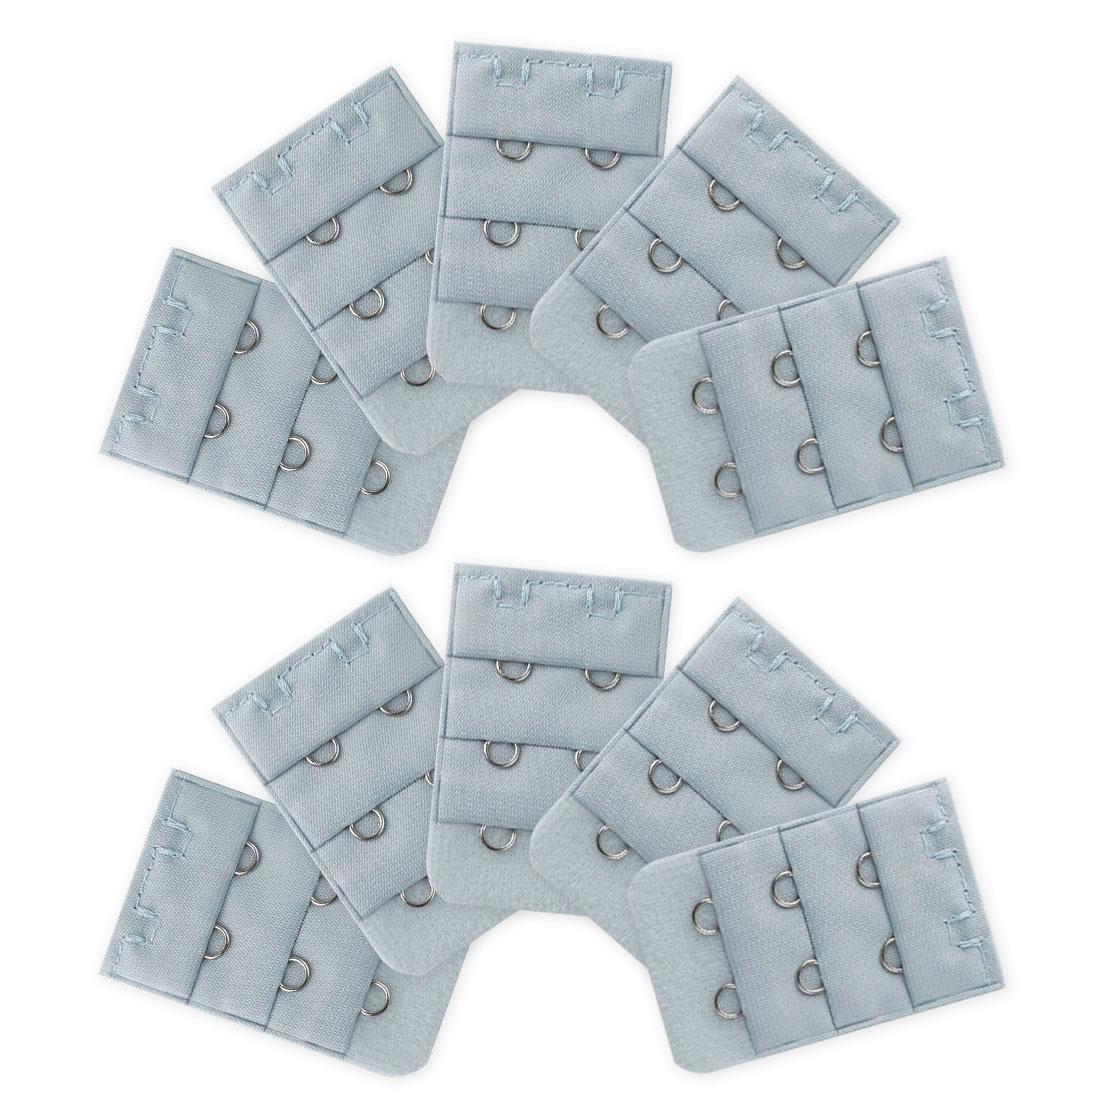 Ladies 3 Rows 2 Hooks Underwear Eye Tape Bra Strap Extender 10 Pcs Gray